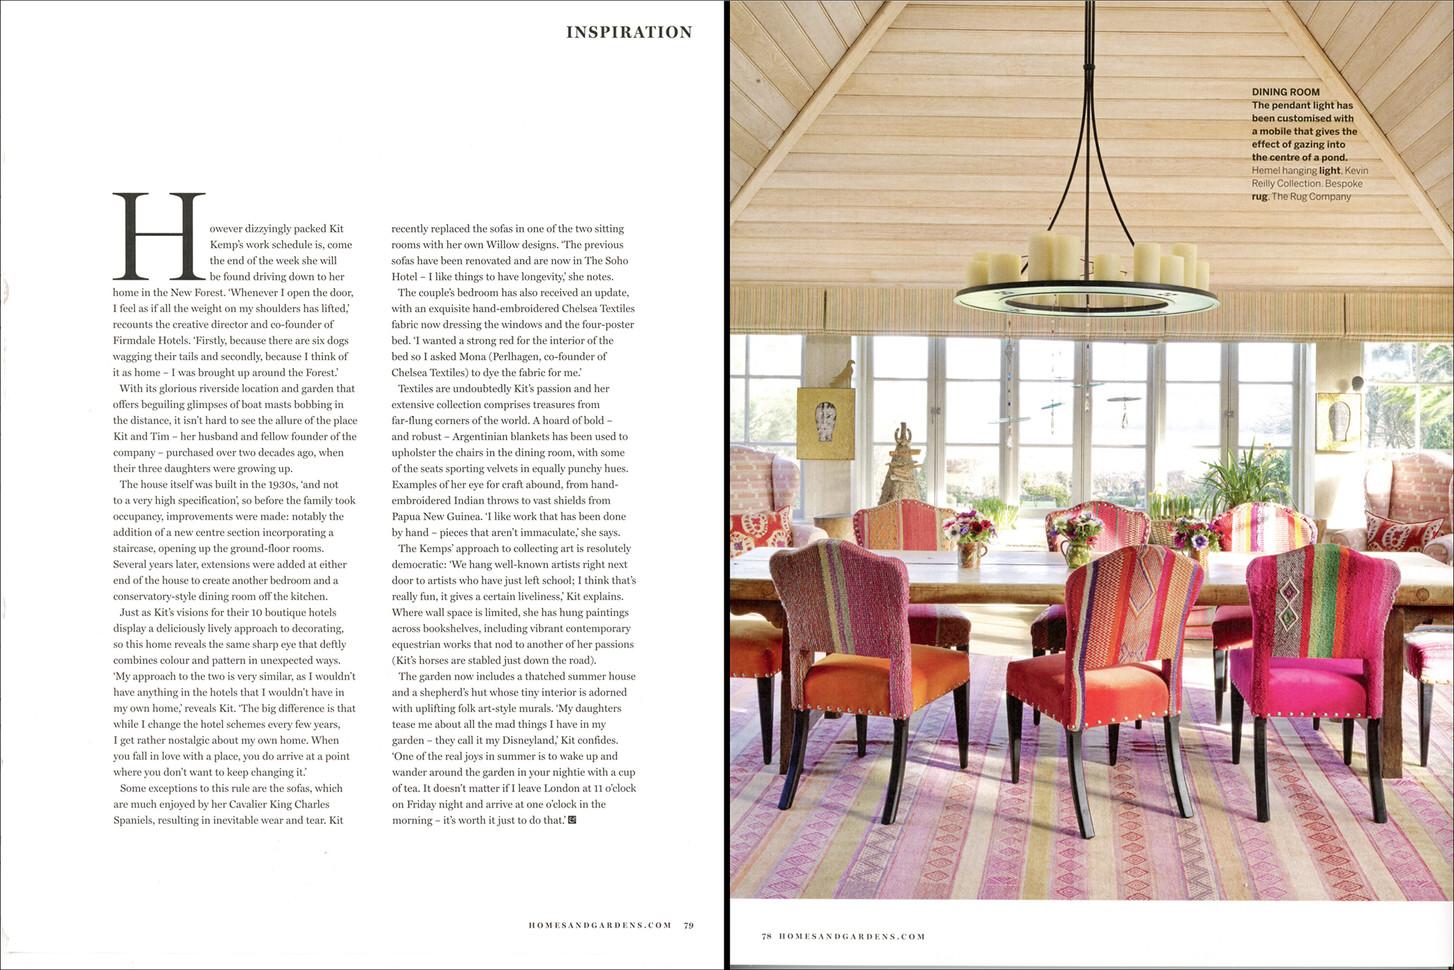 Kit Kemp, Guest Edit of Homes & Gardens, June 2020